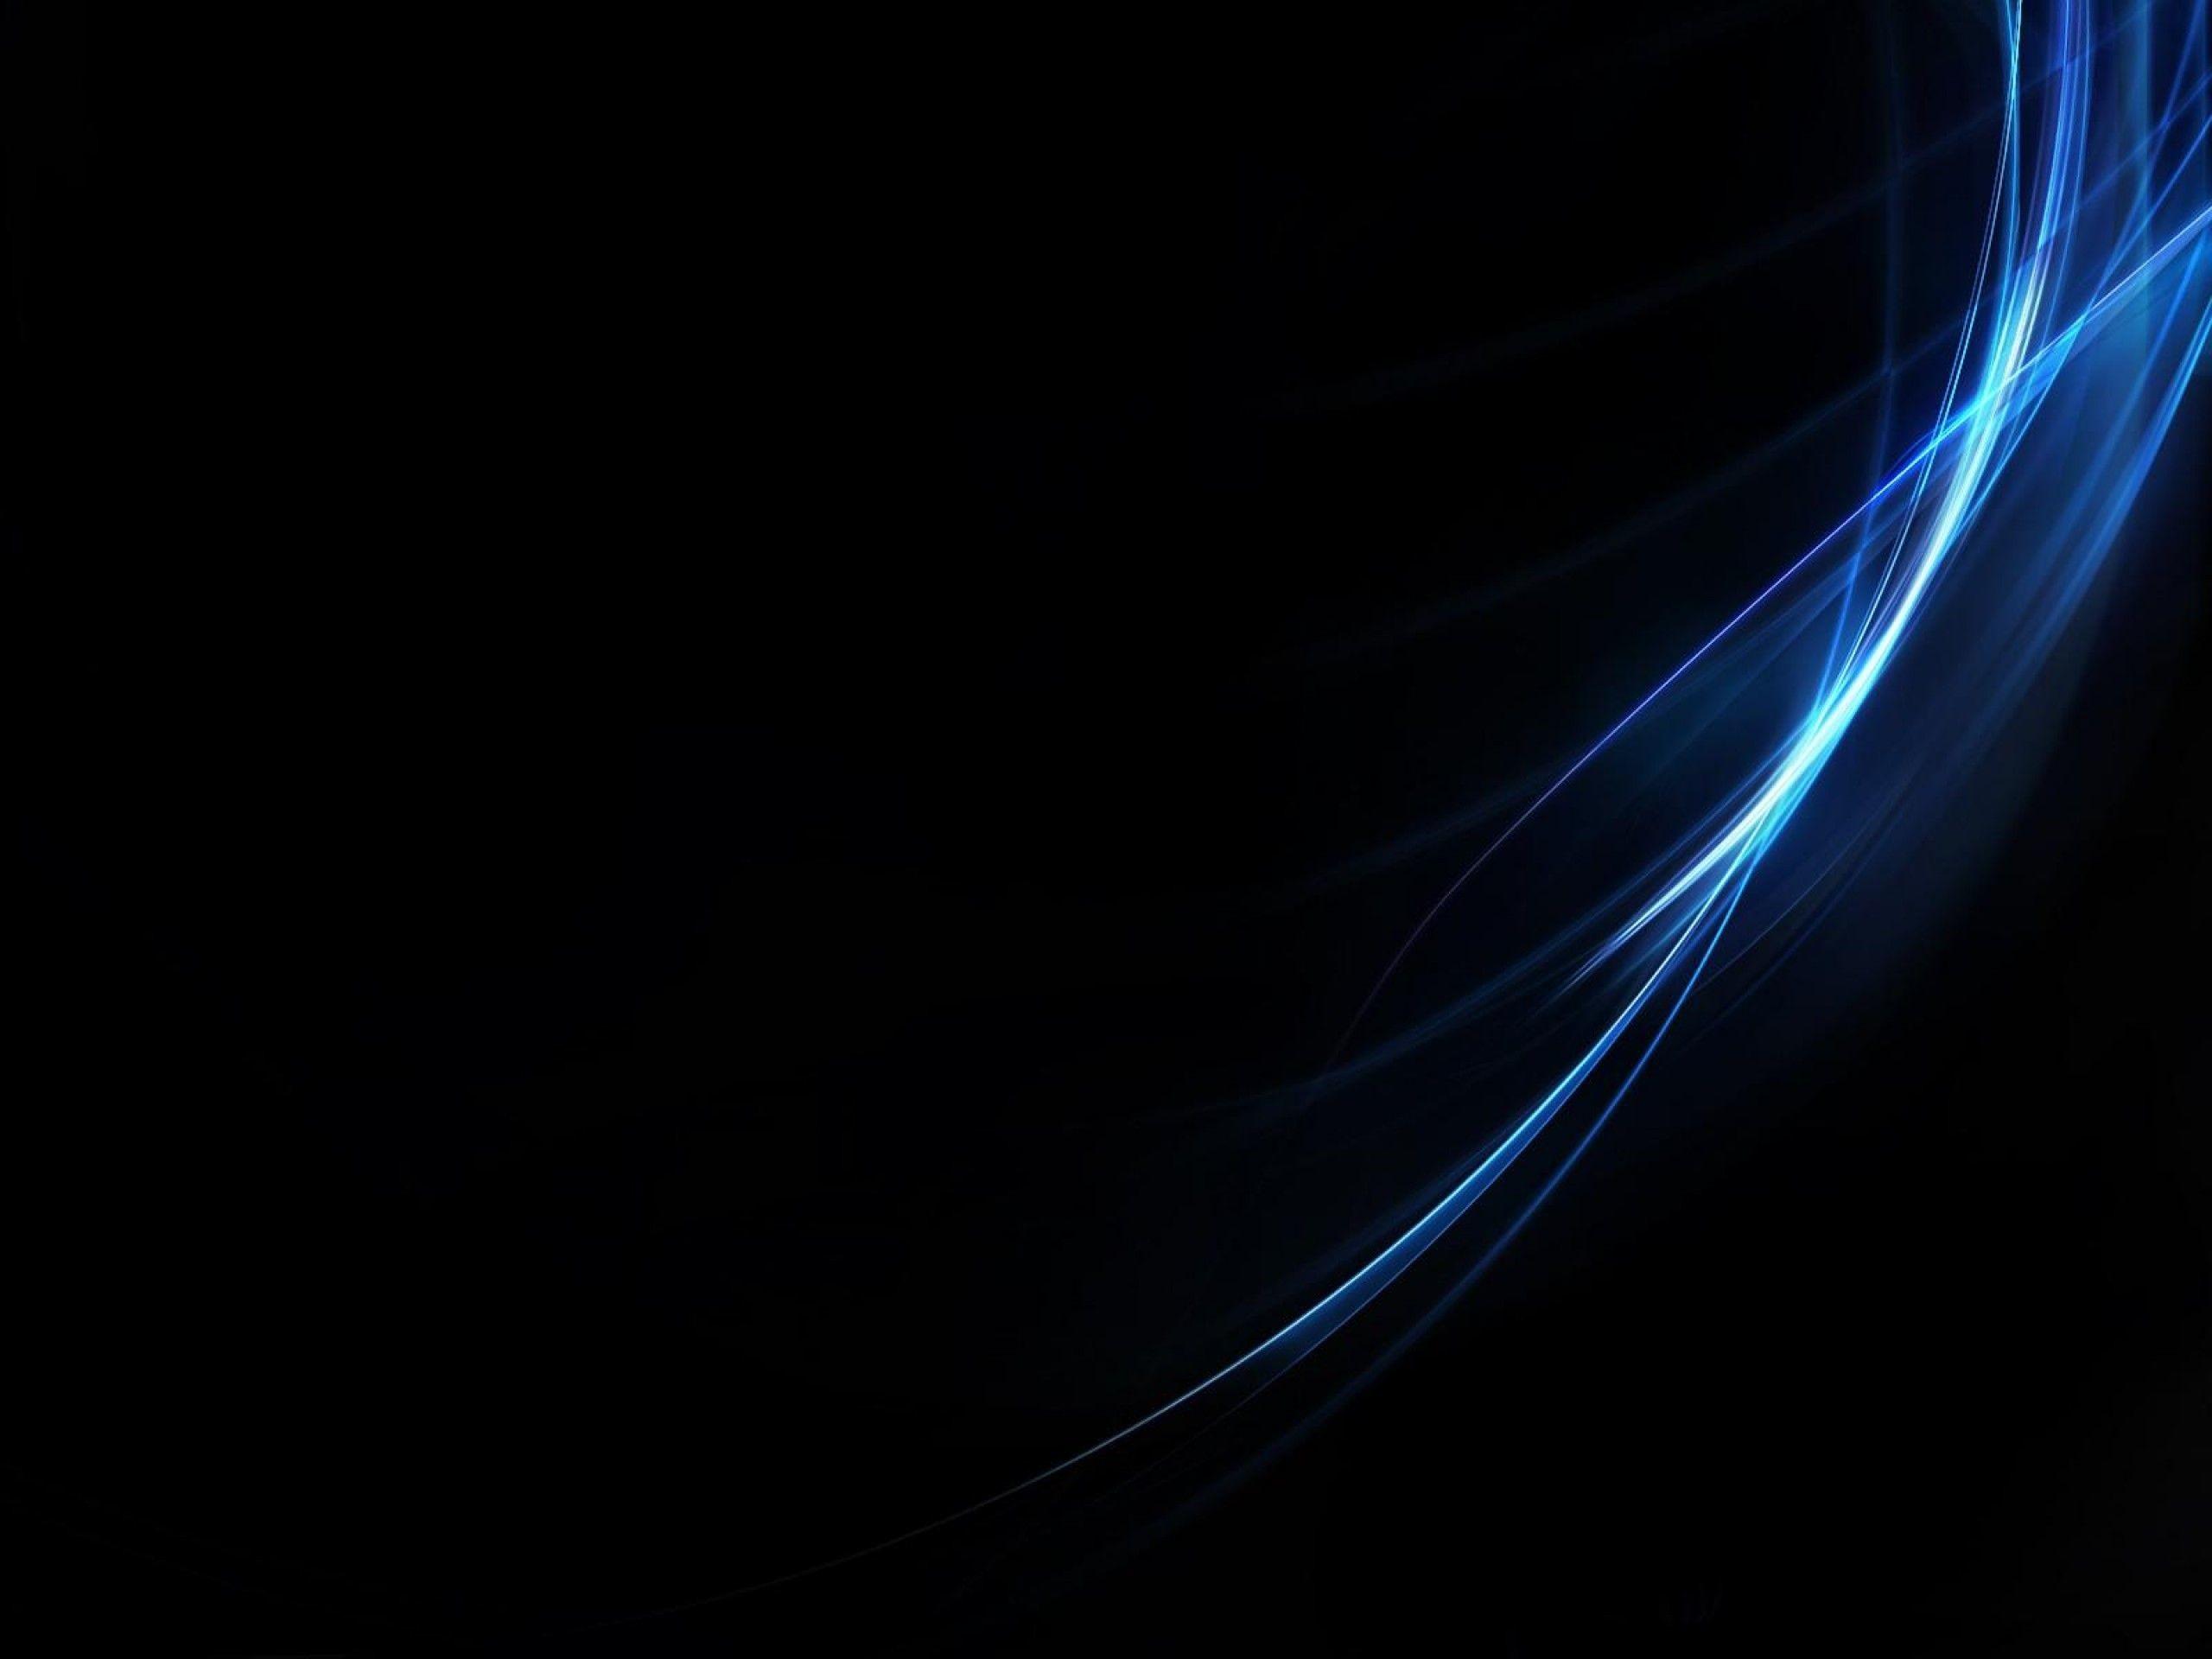 Download Dark Blue Wallpaper Images #8pt ~ Petakilan.com